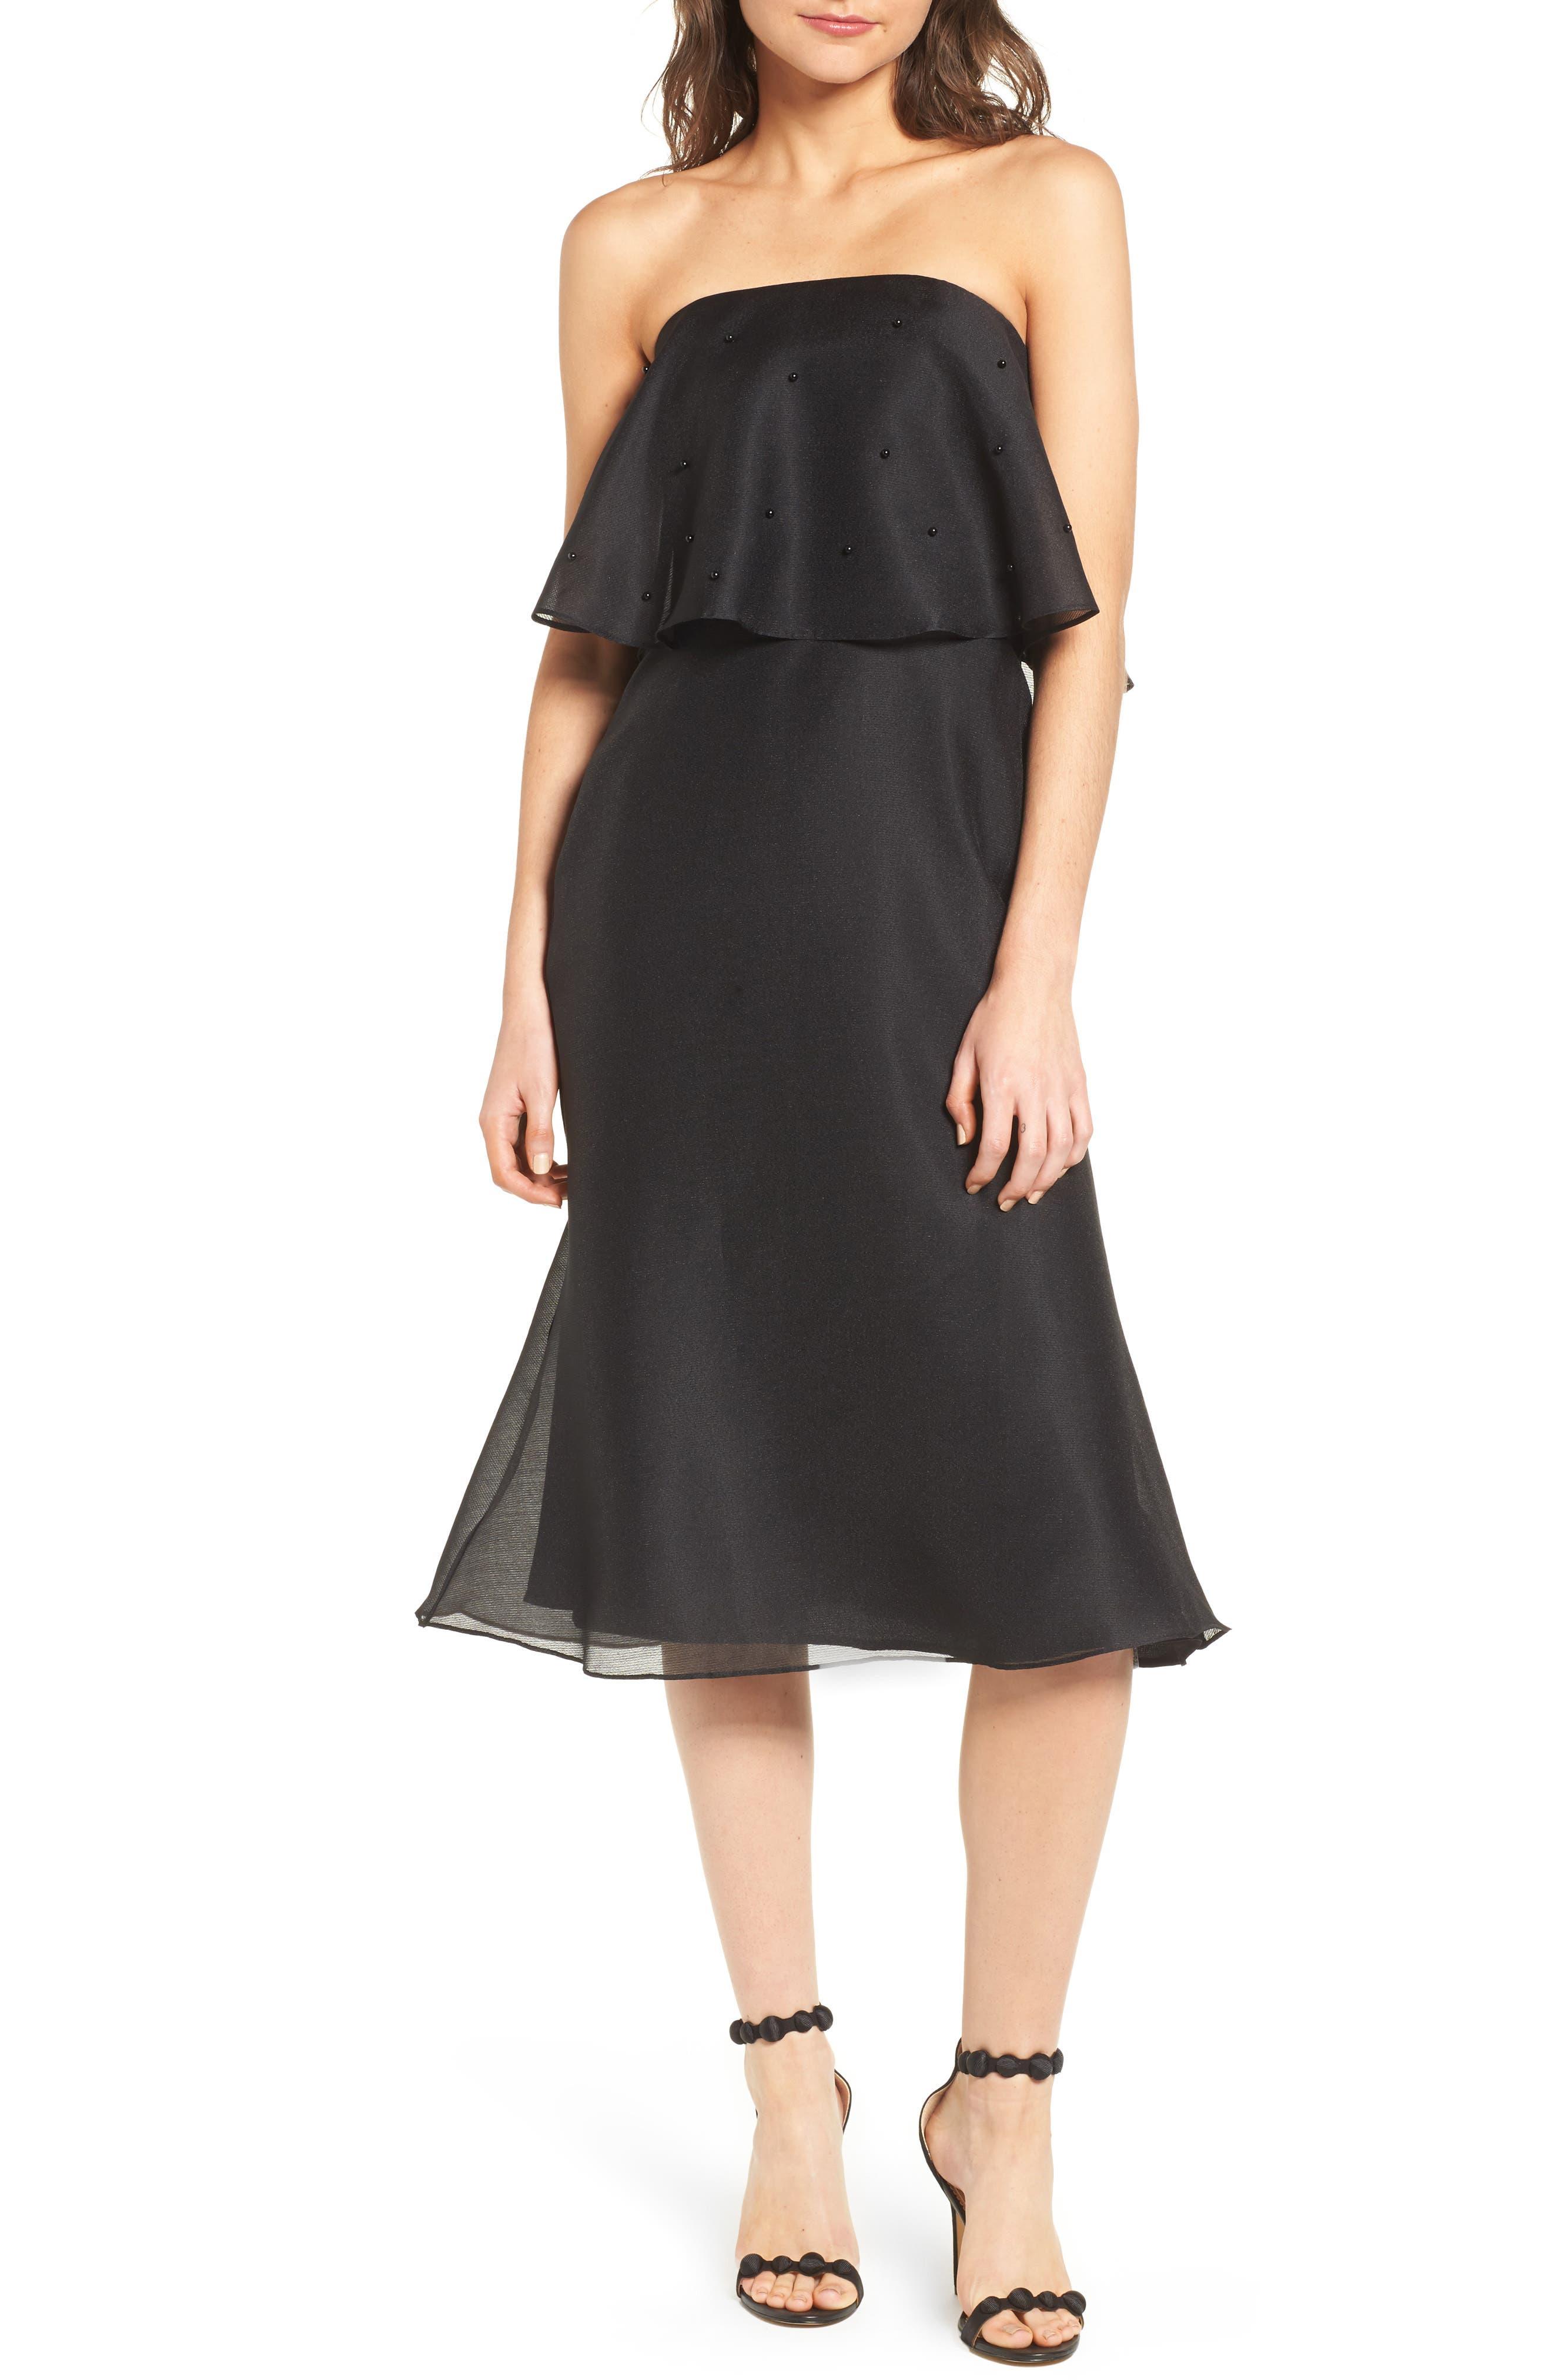 Alternate Image 1 Selected - Keepsake the Label Call Me Strapless Dress